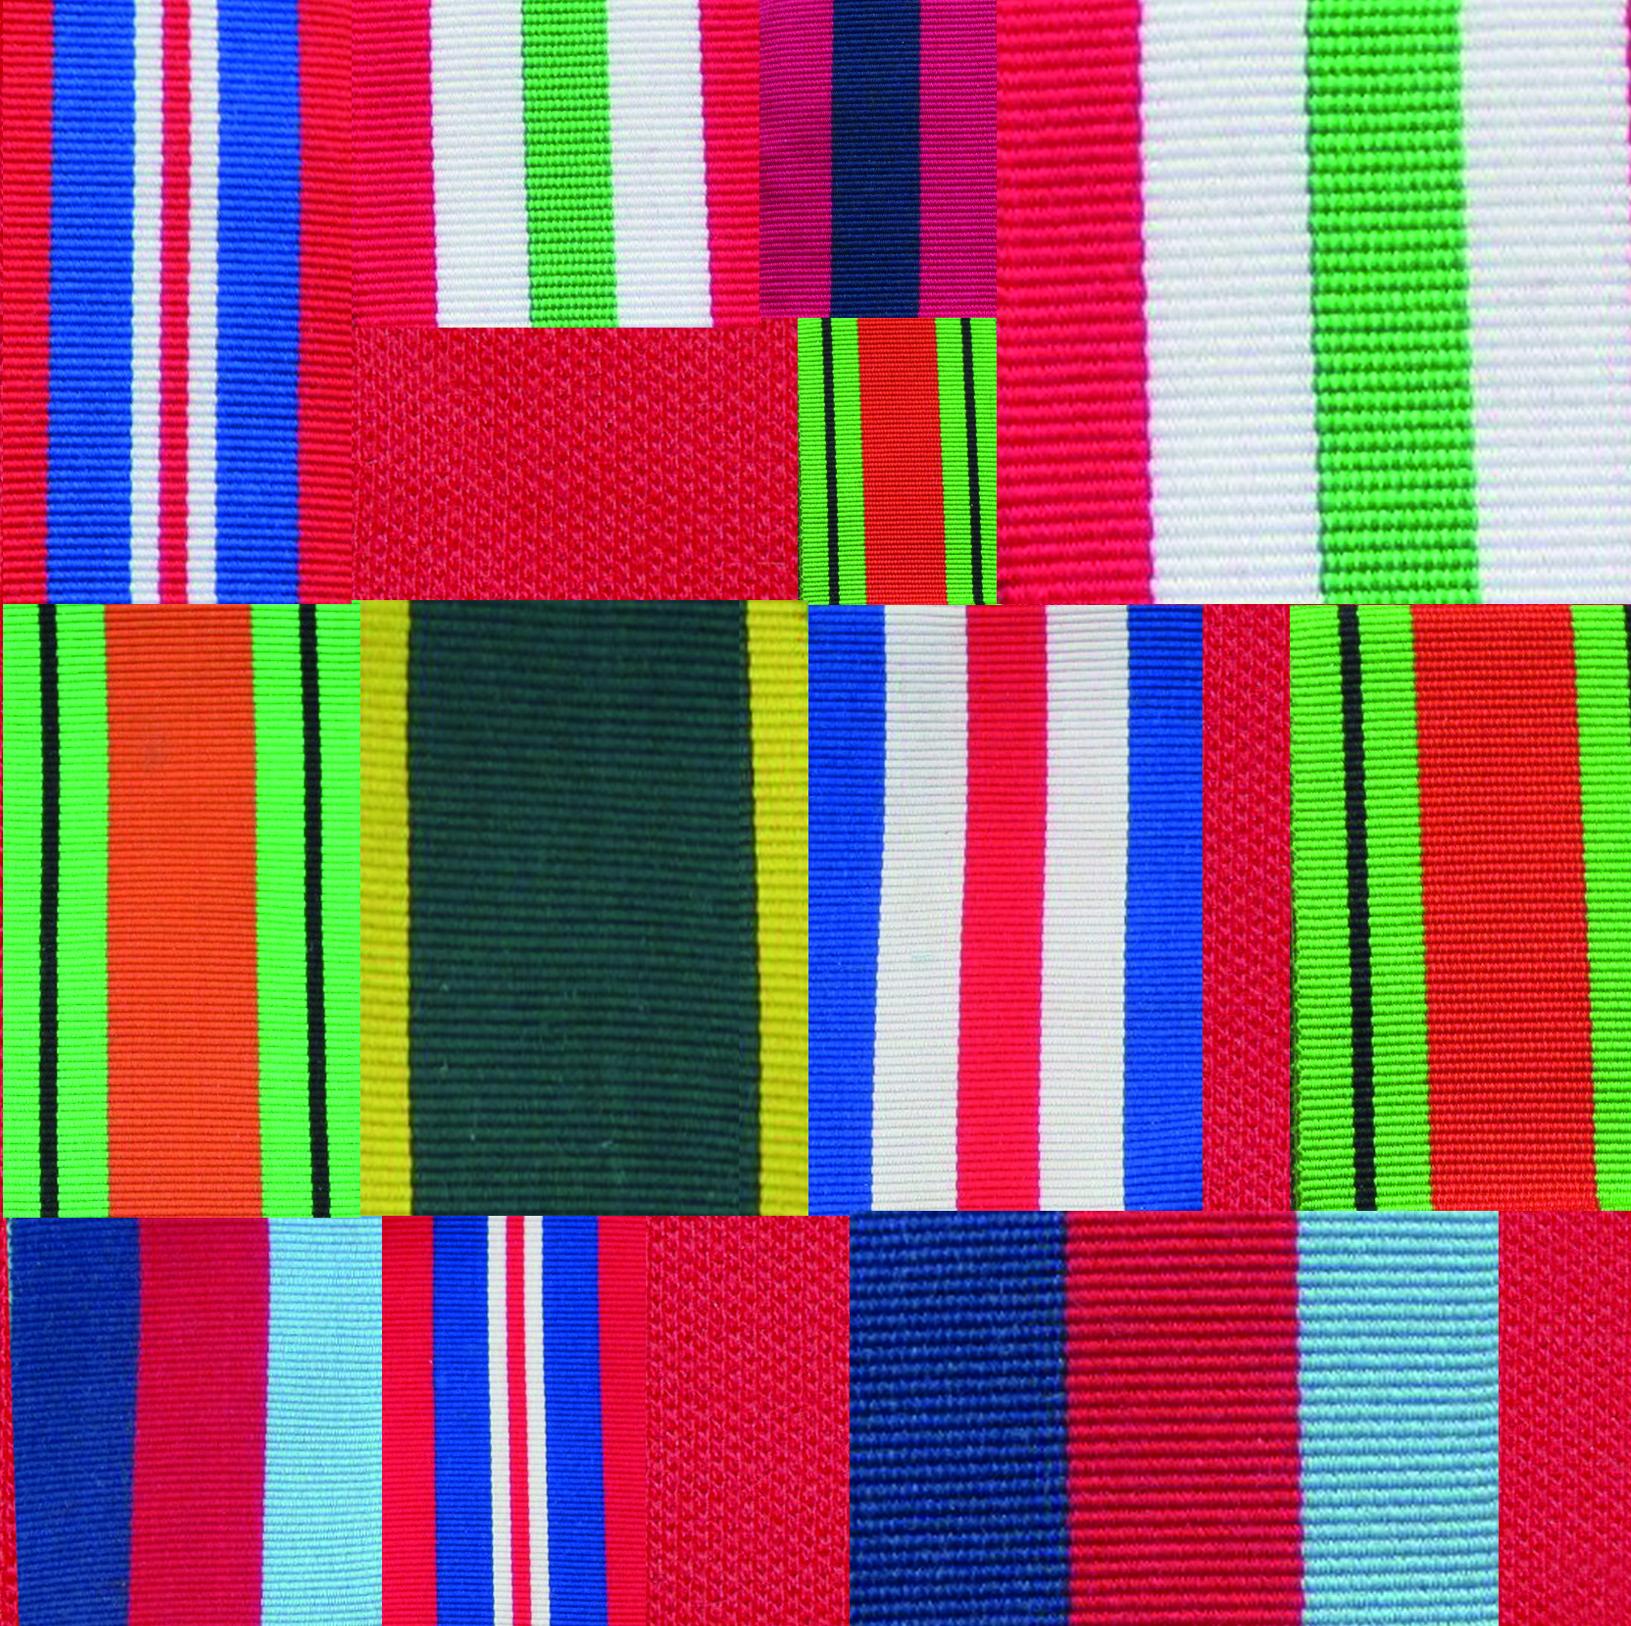 6.A5 WW2  Medal Ribbons.jpg